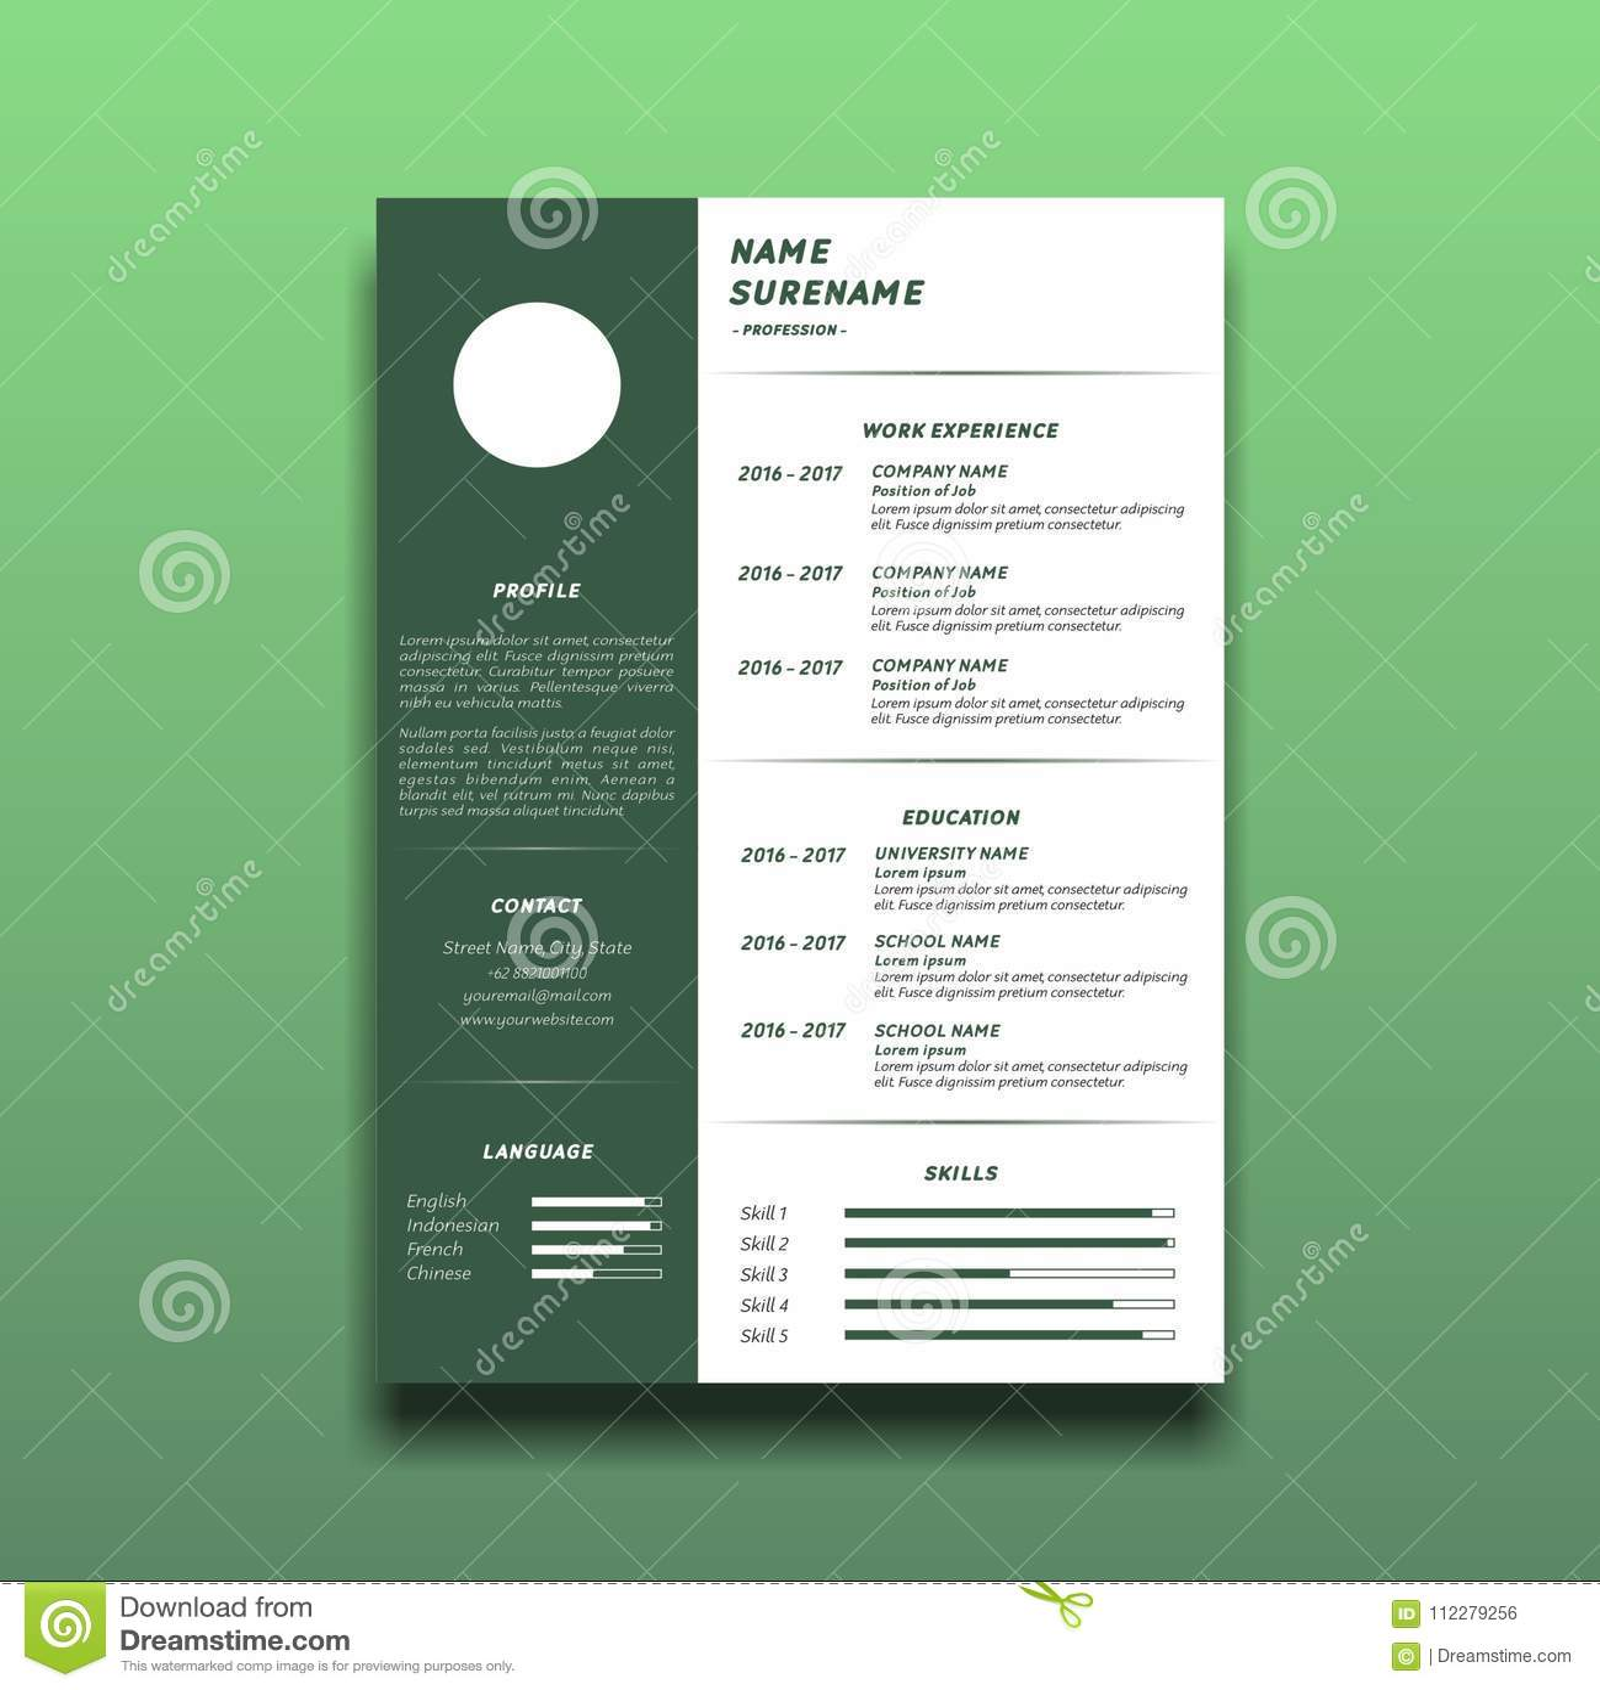 Simple Curriculum Vitae Template Stock Vector Illustration Of